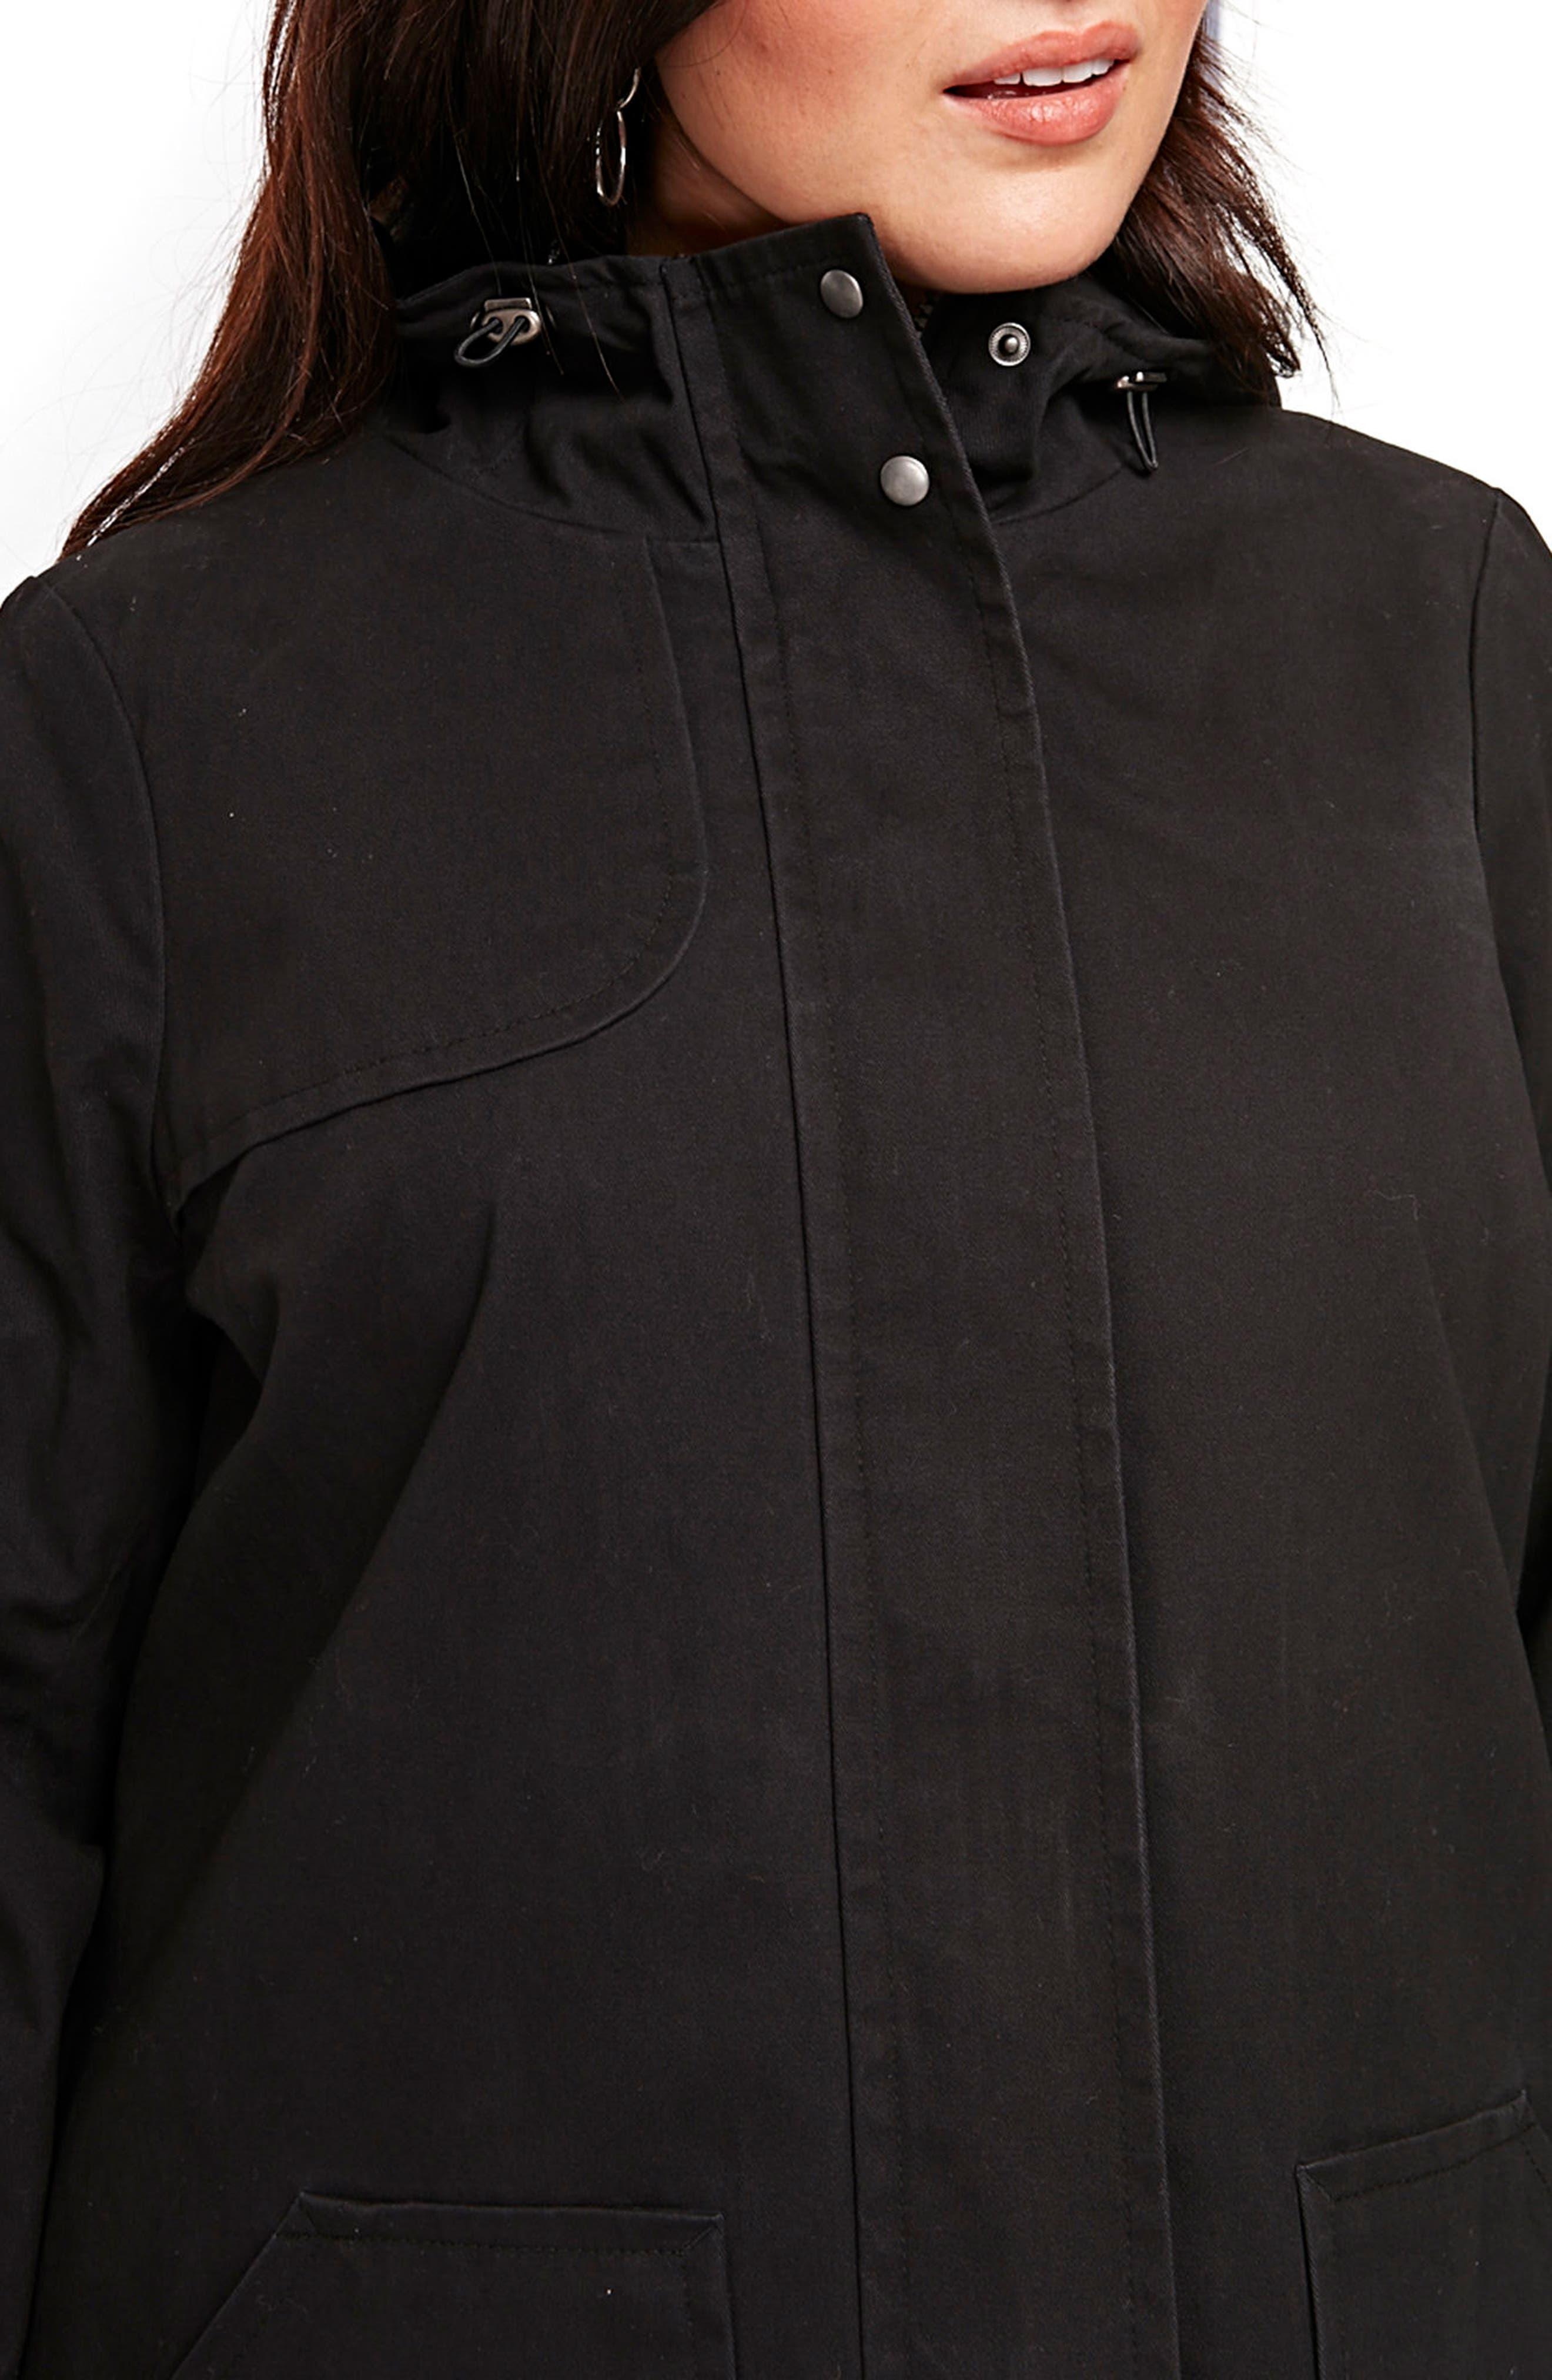 Mac Jacket,                             Alternate thumbnail 2, color,                             Black